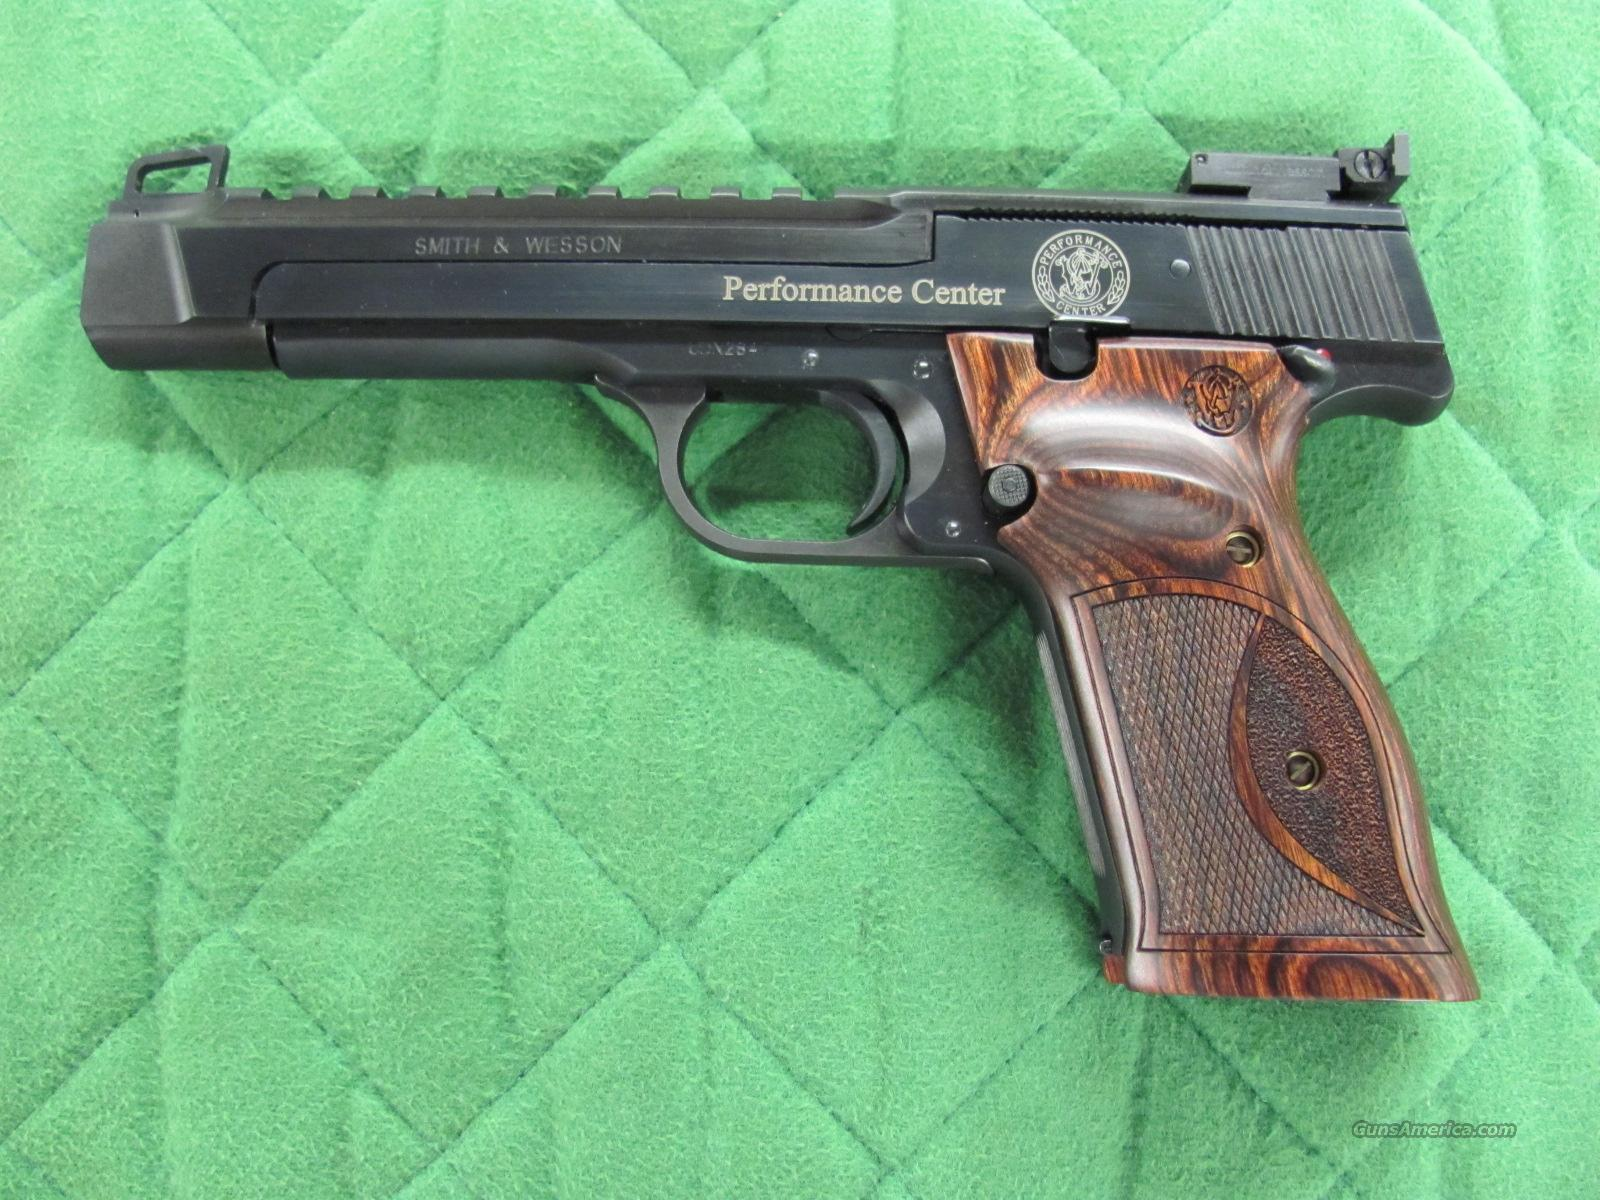 Smith & Wesson Model 41 Performance Center .22 LR 178031  Guns > Pistols > Smith & Wesson Pistols - Autos > .22 Autos